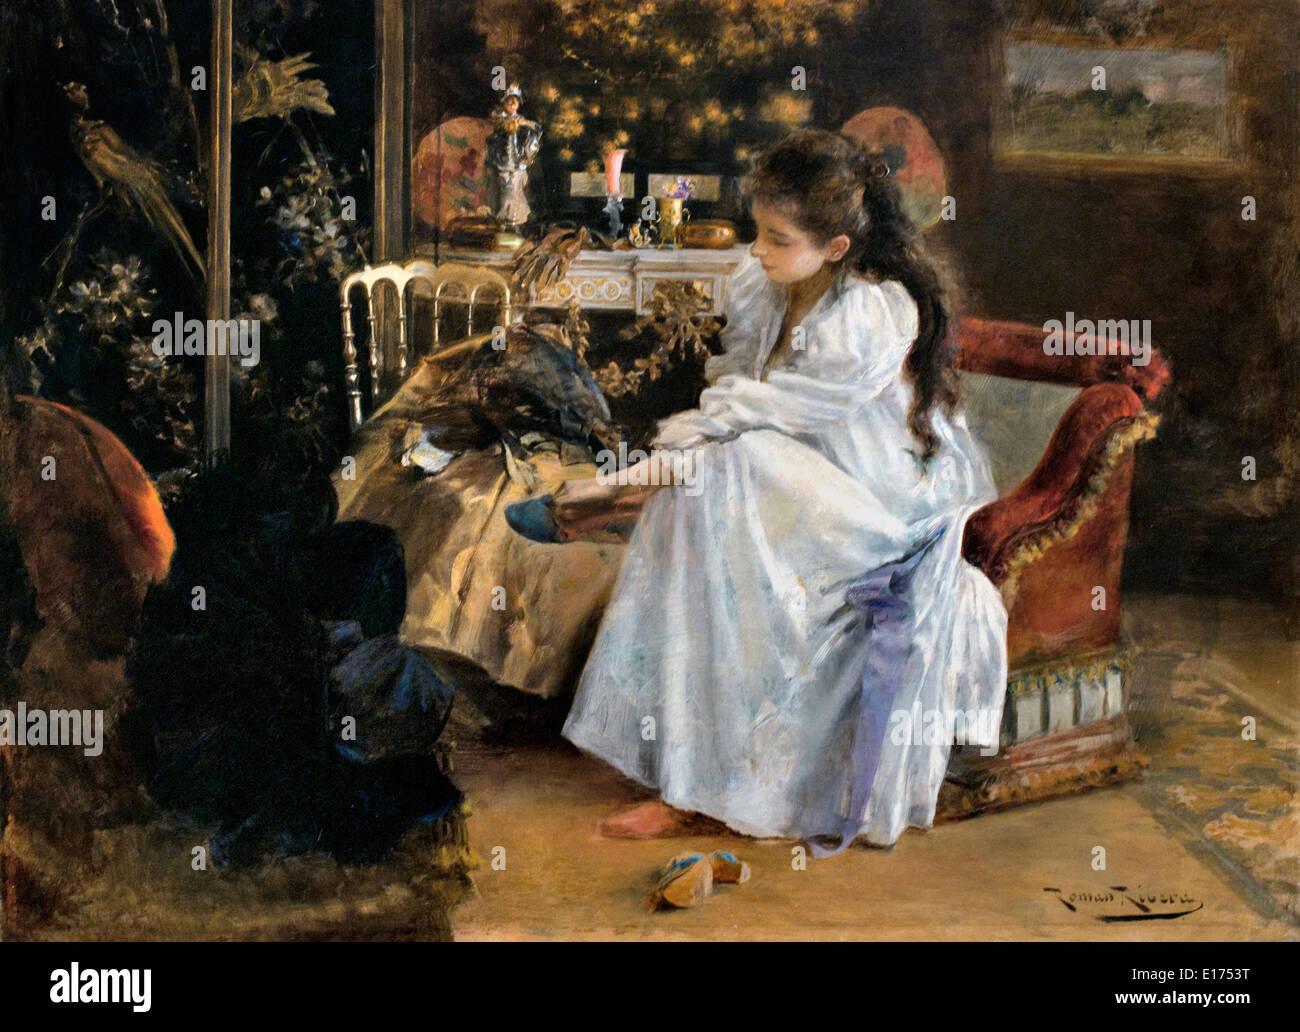 De soirée 1894 Romà Ribera 1893 Spain Spanish - Stock Image